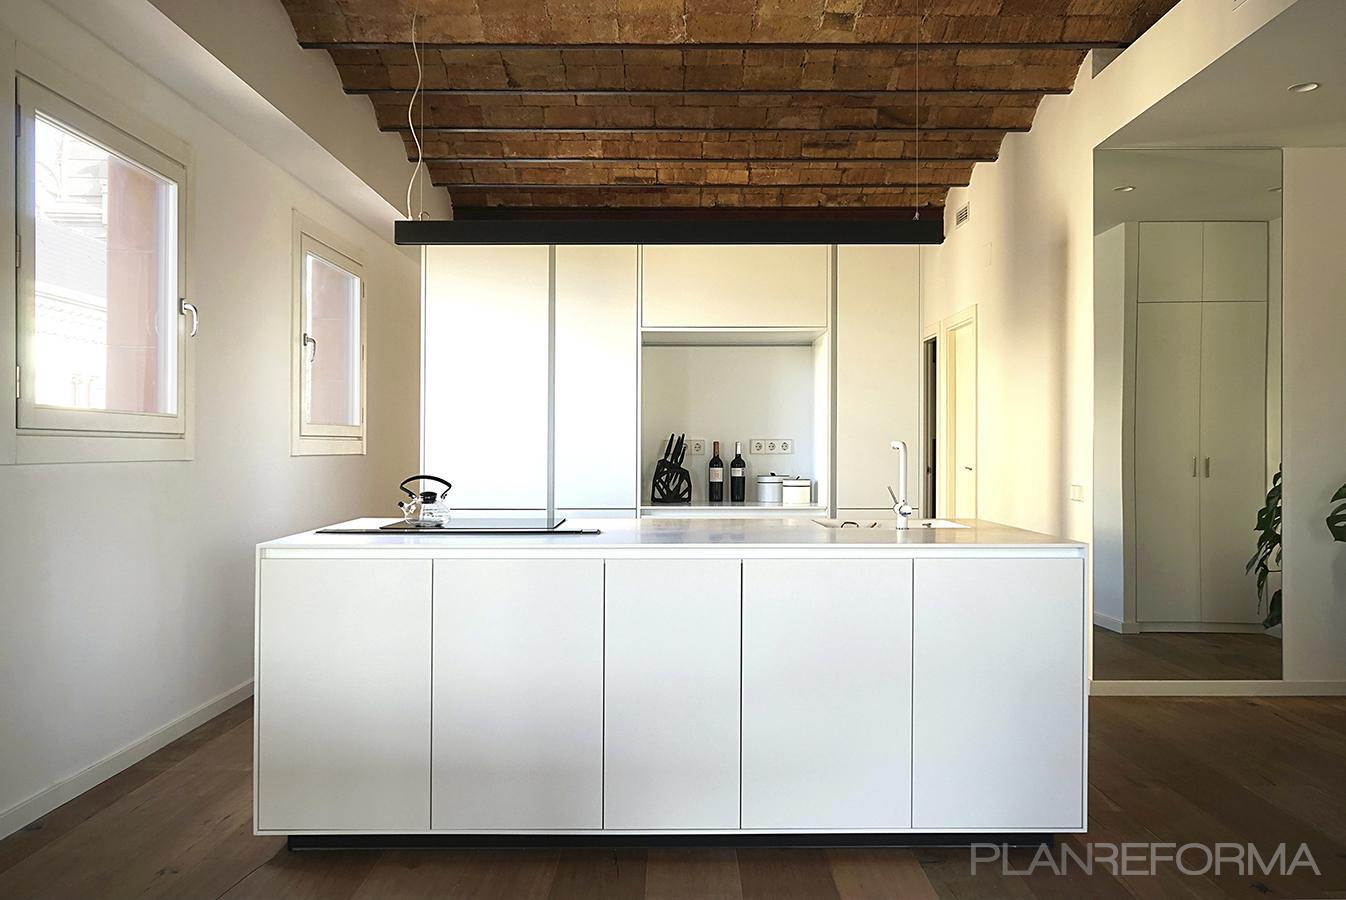 Cocina Estilo moderno Color marron, blanco, negro  diseñado por mcd/studio | Arquitecto | Copyright si